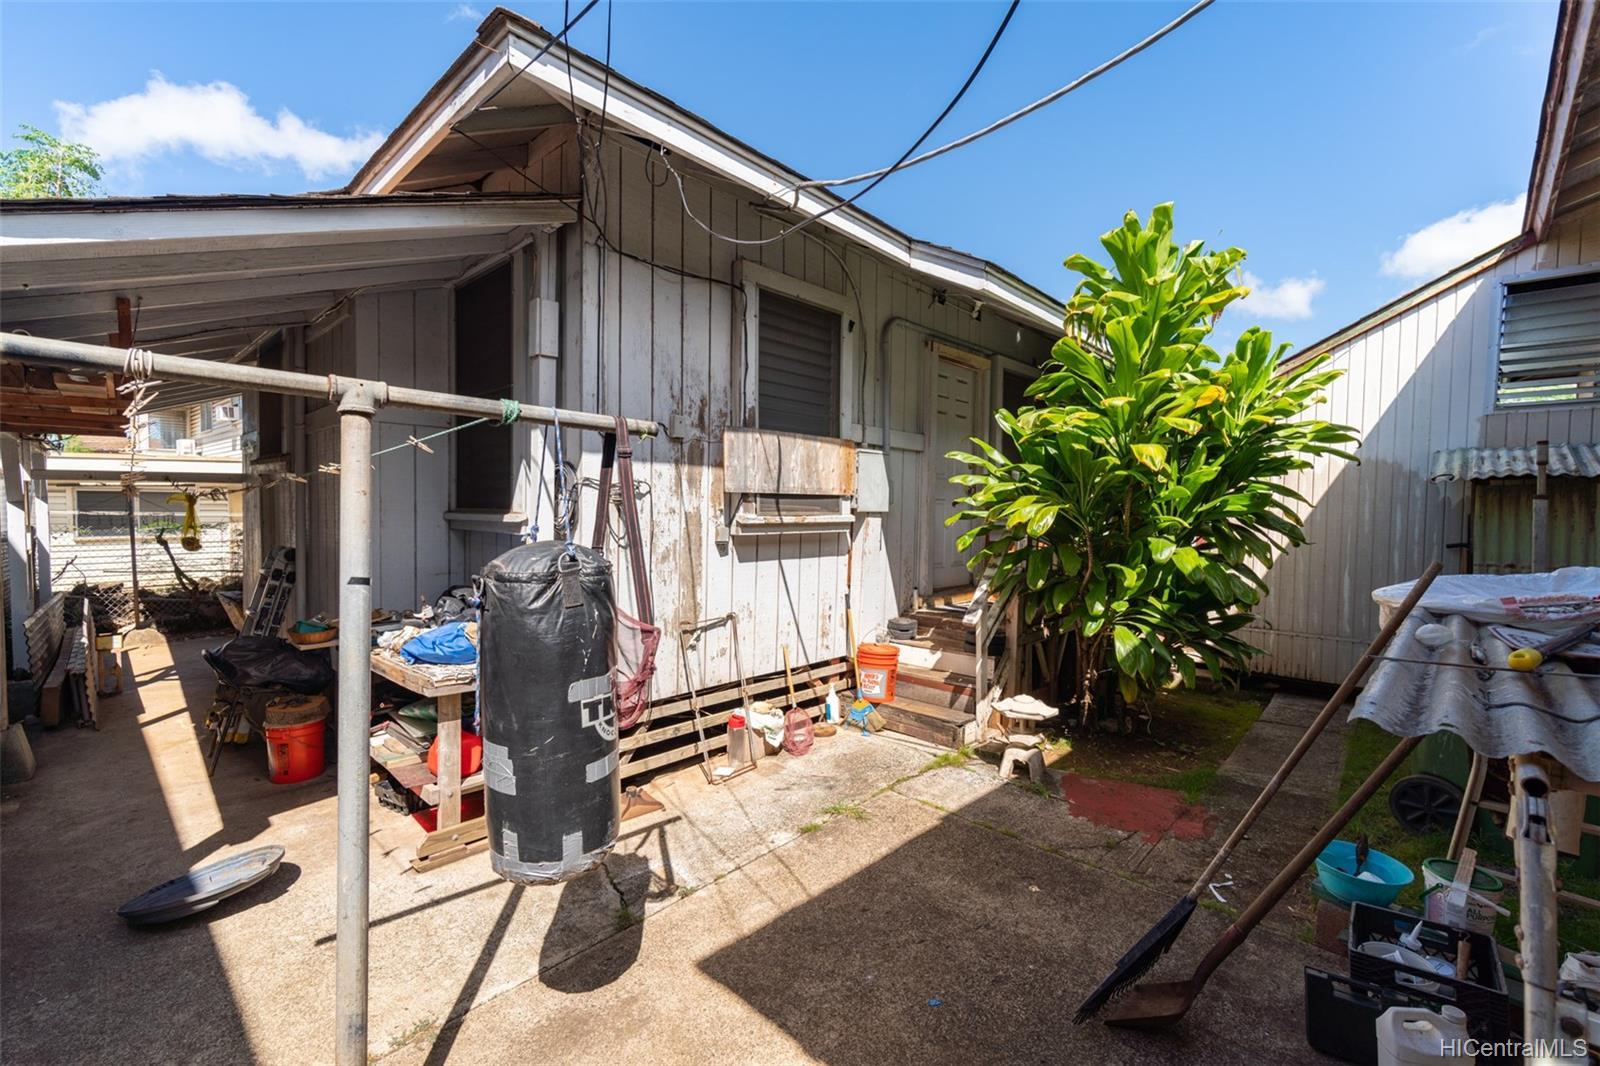 1214 Kamehameha IV Road Honolulu - Multi-family - photo 7 of 20